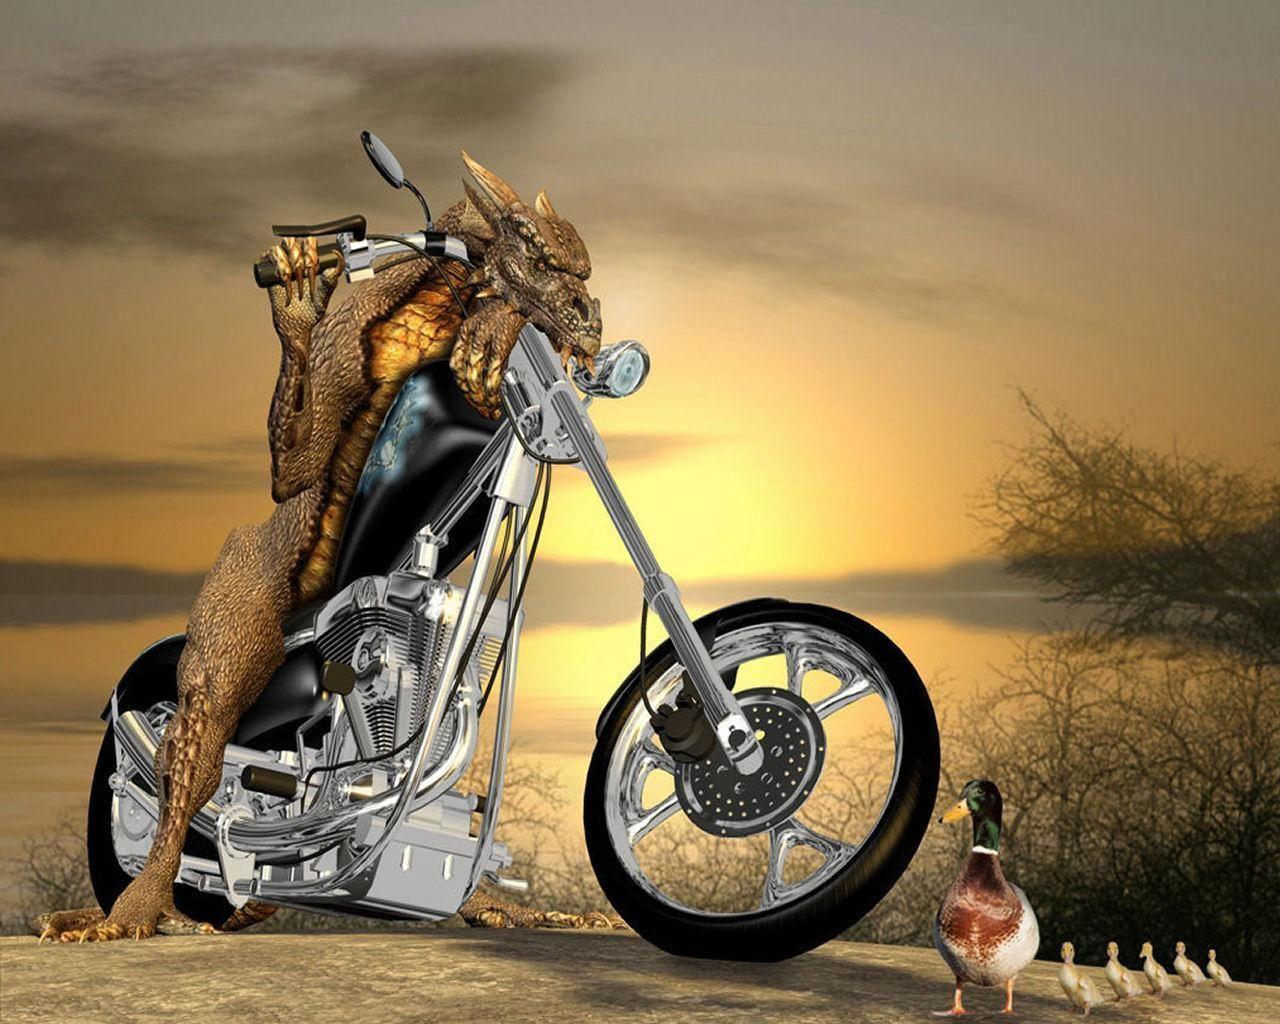 50 Best Free Cool Biker Wallpapers